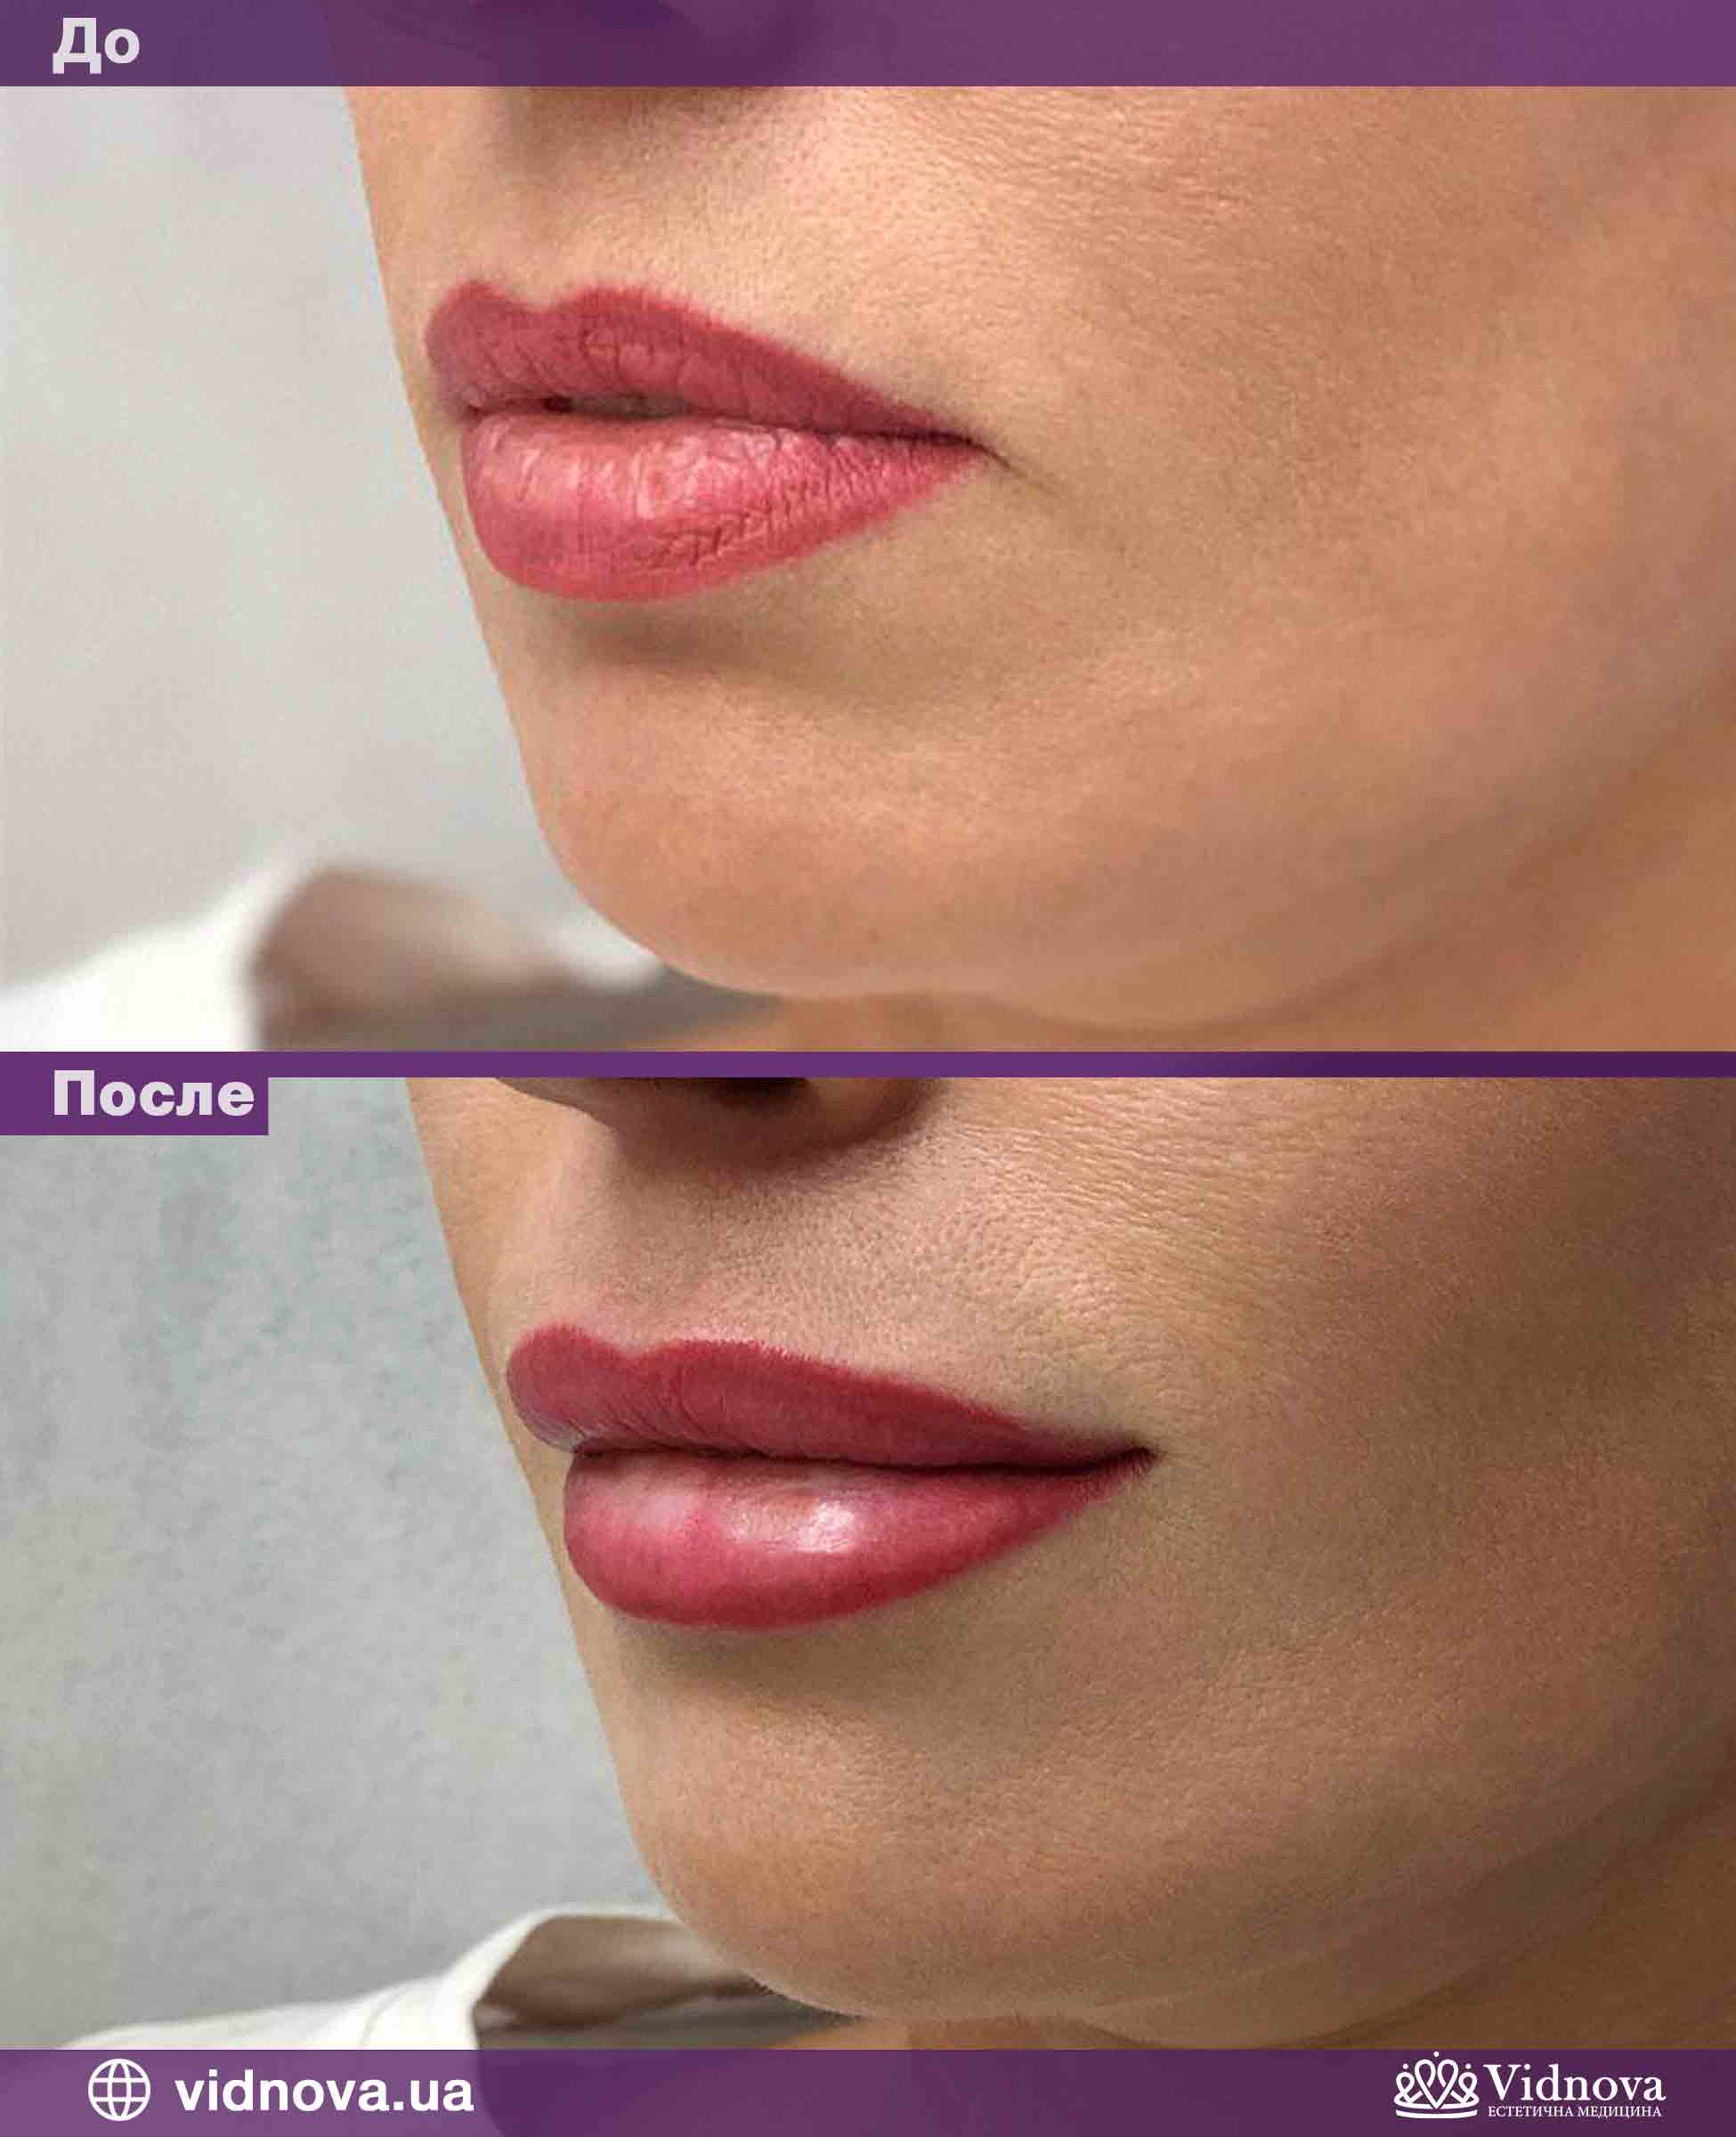 Увеличение губ: Фото До и После - Пример №3-3 - Клиника Vidnova